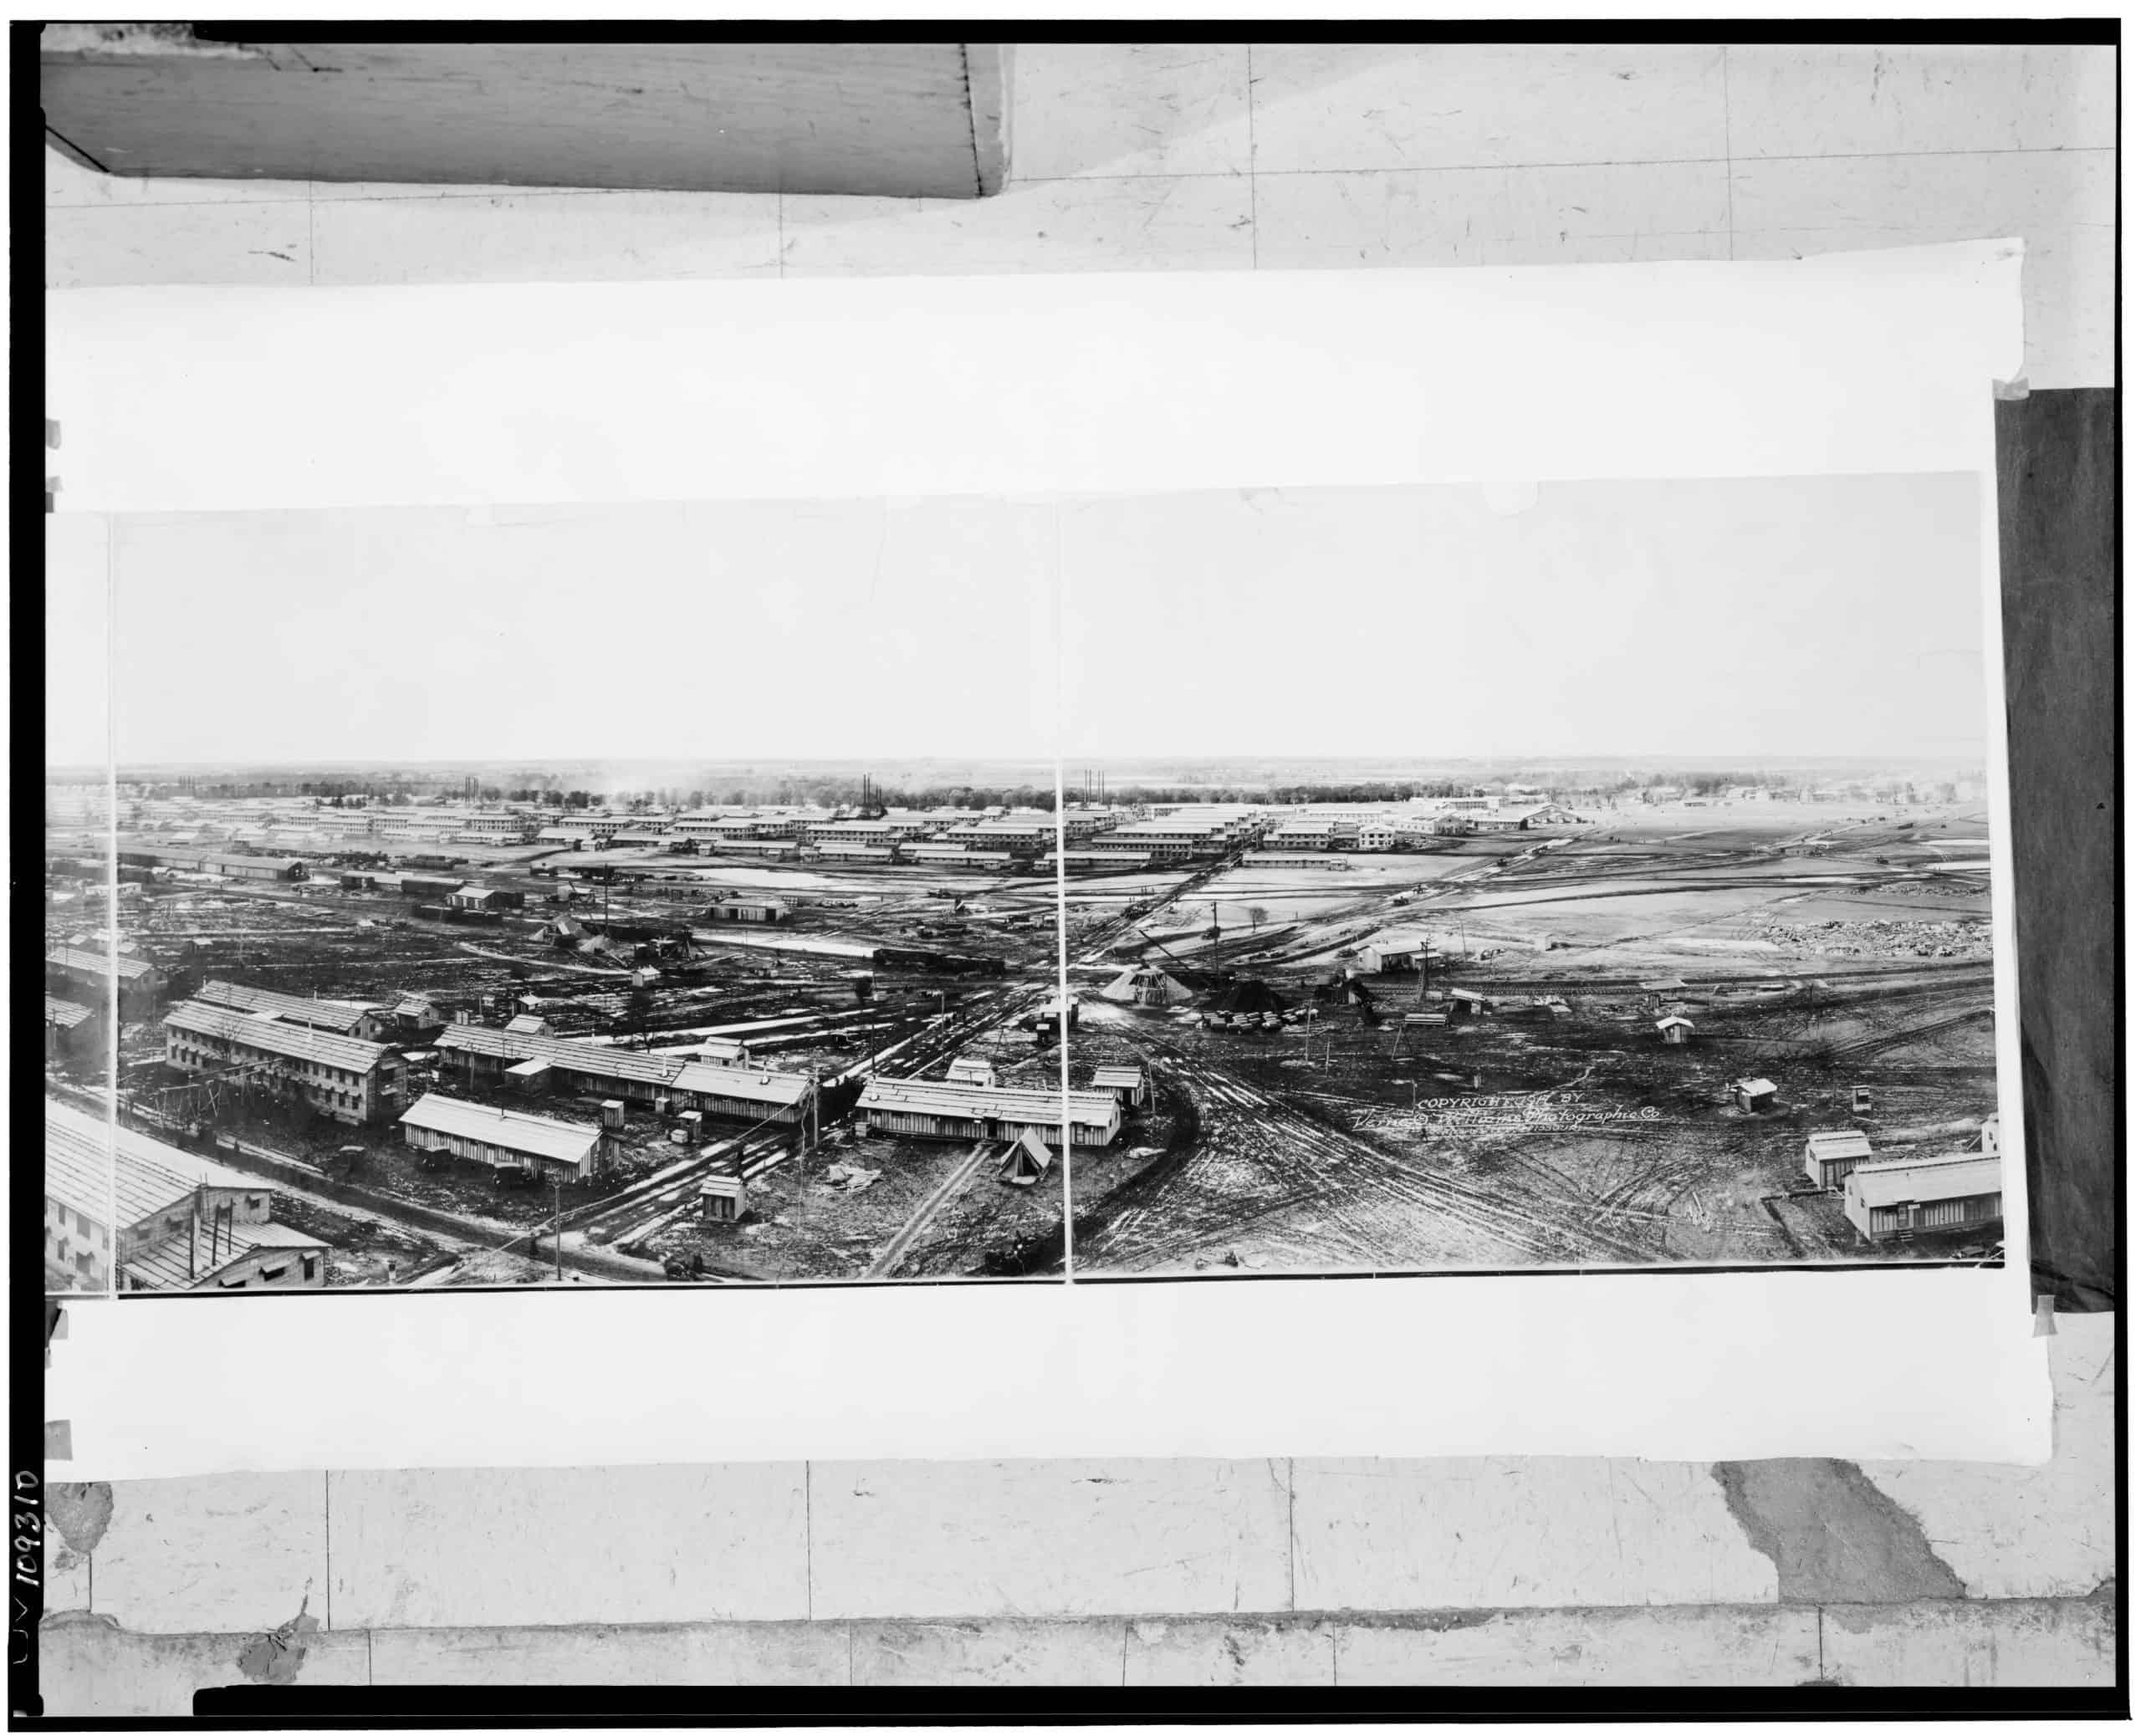 Camp Grant, Rockford, Illinois, Verne O. Williams Photographic Co, ca 1918